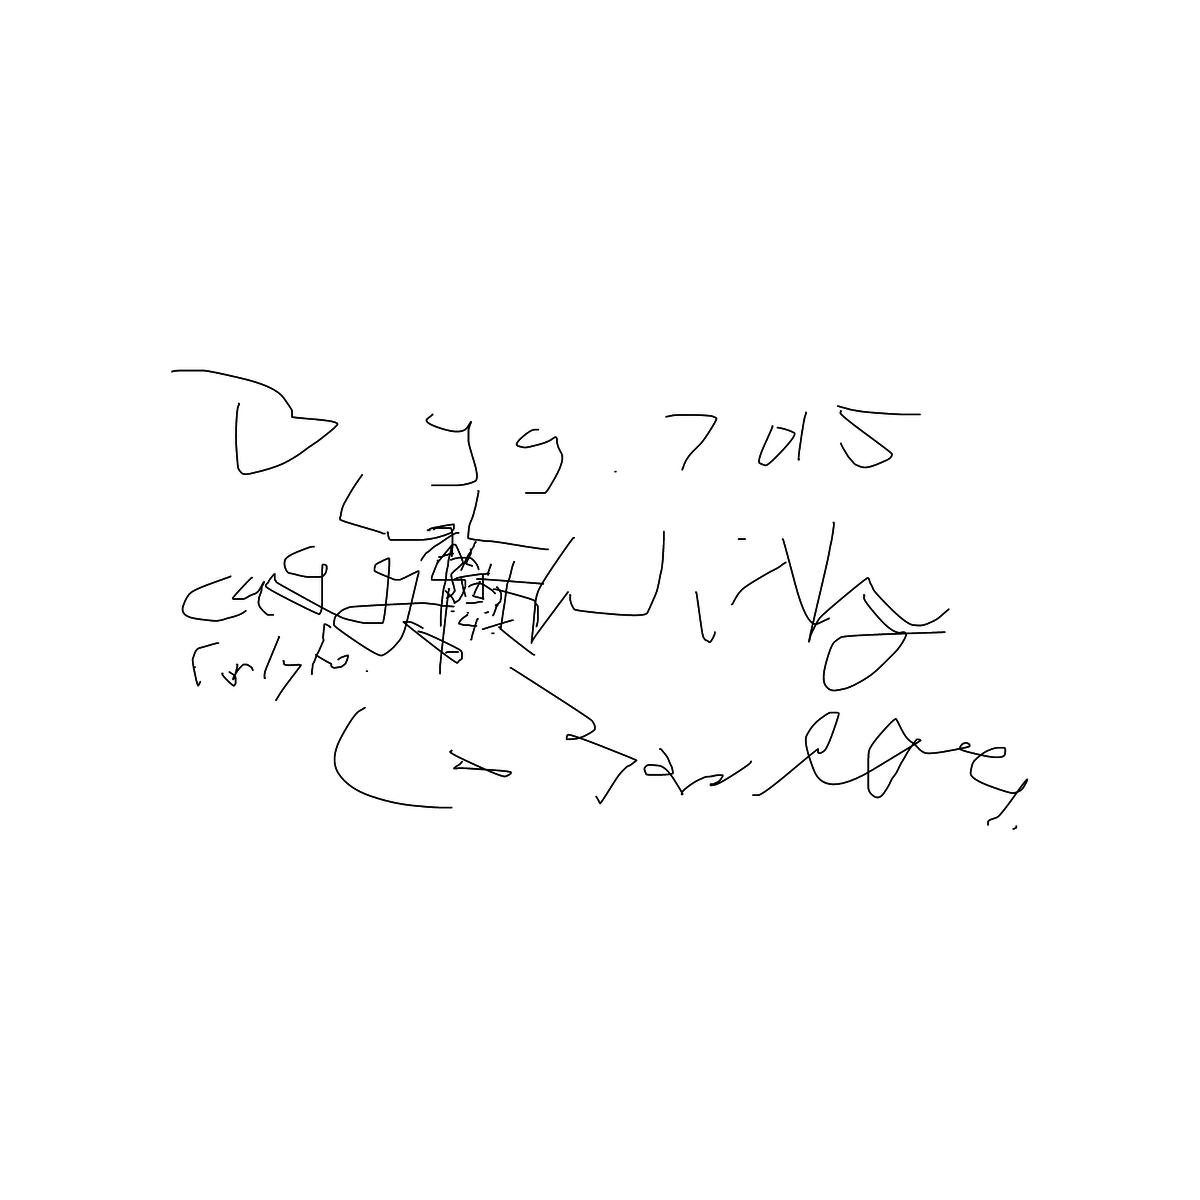 BAAAM drawing#2735 lat:43.8211898803710940lng: -79.2893981933593800